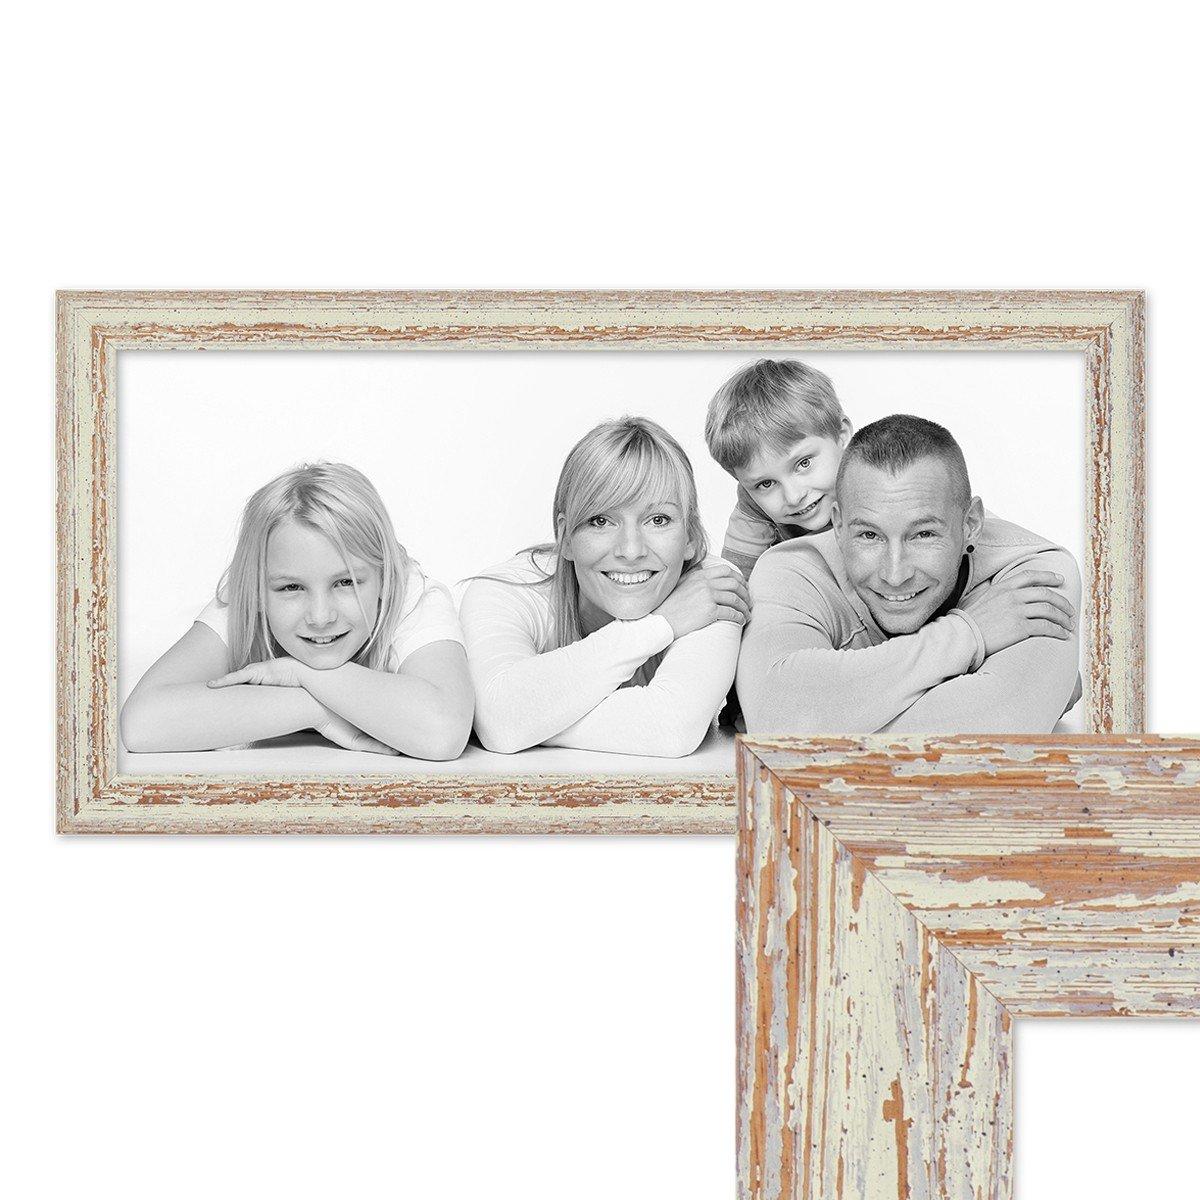 Amazon.de: PHOTOLINI Panorama-Bilderrahmen Vintage 30x60 cm Weiss ...